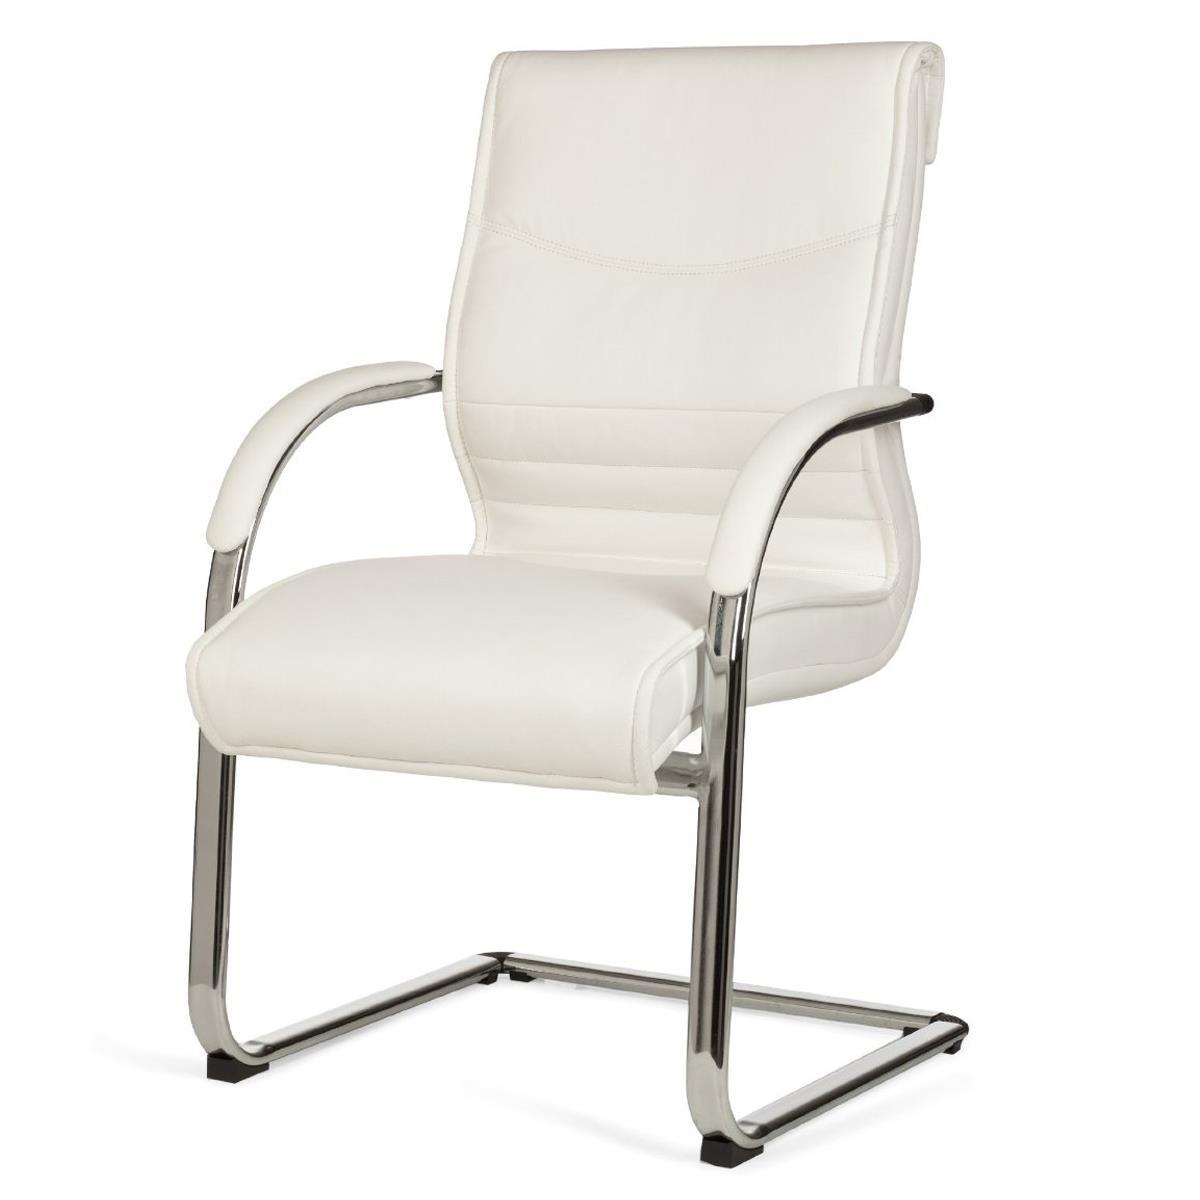 Sedia ergonomica per sala d 39 attesa pindo elegante con for Sedia ergonomica